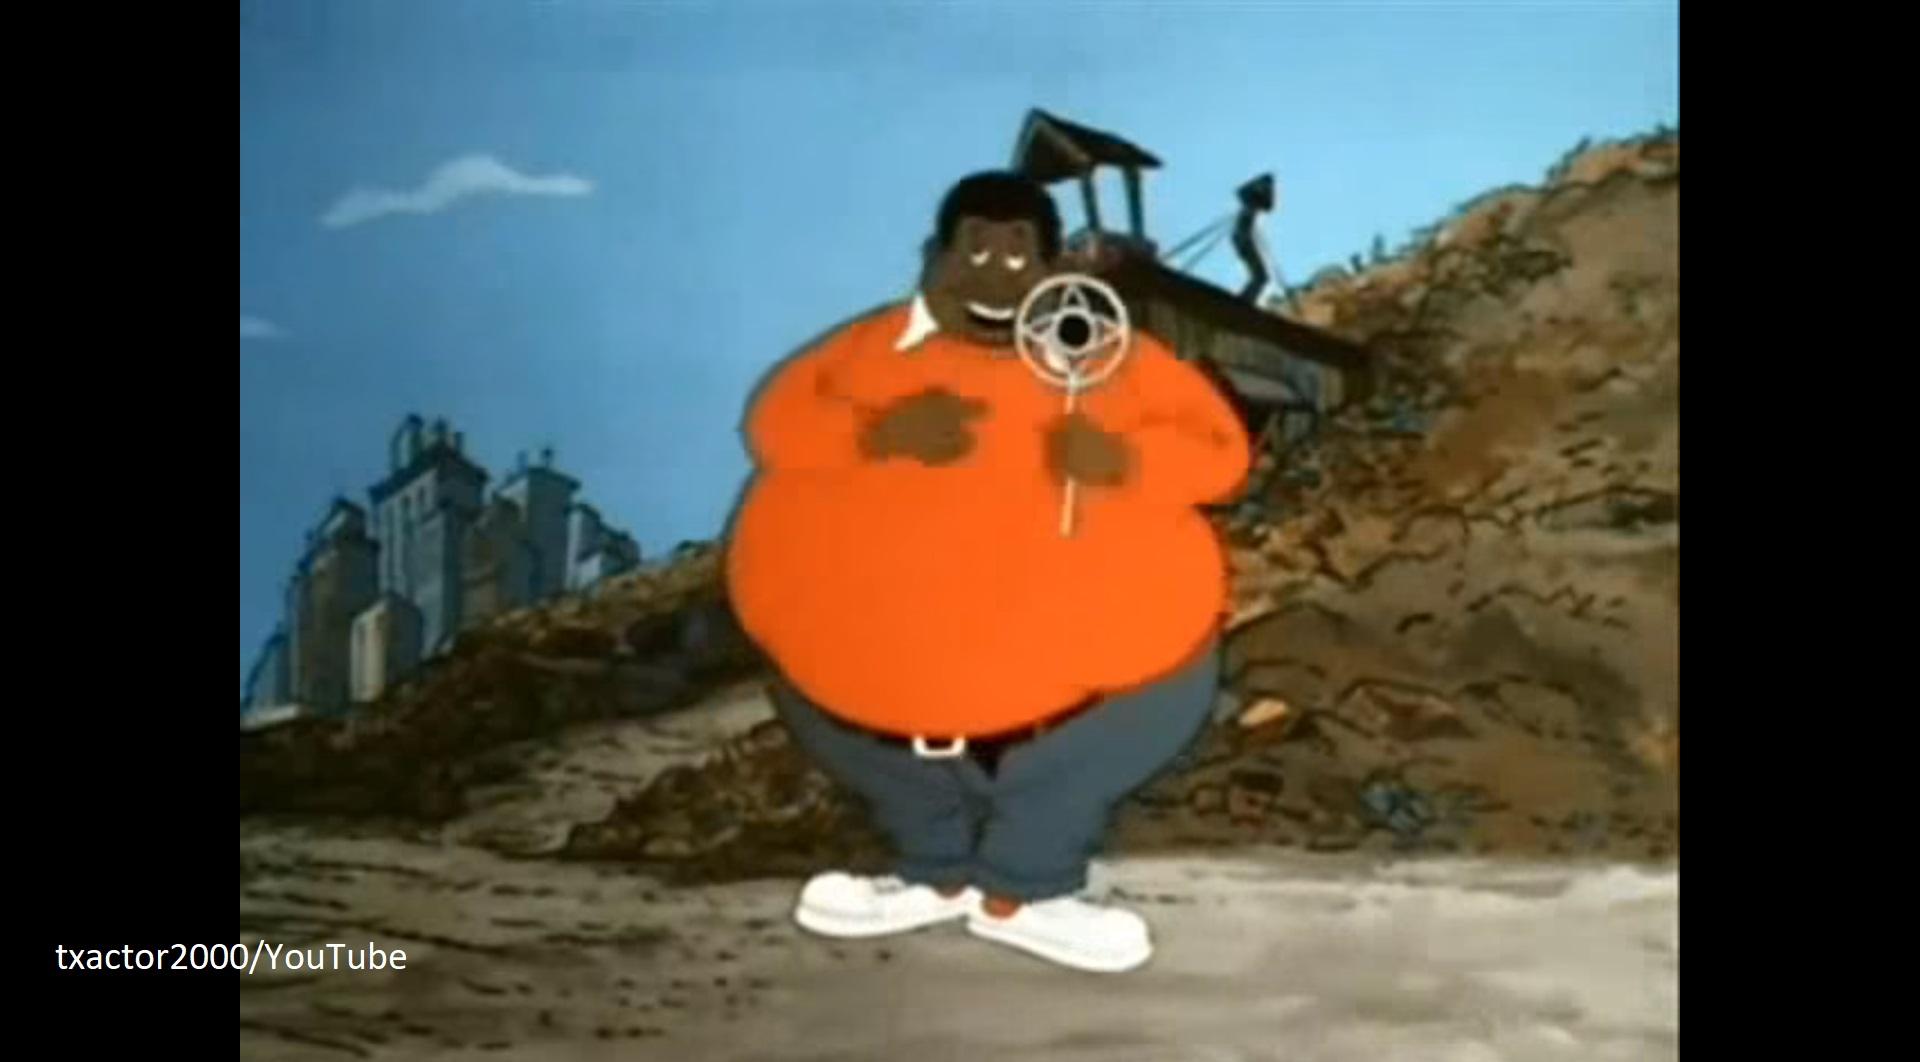 Bill Cosby's Fat Albert cartoon taught children how to handle life